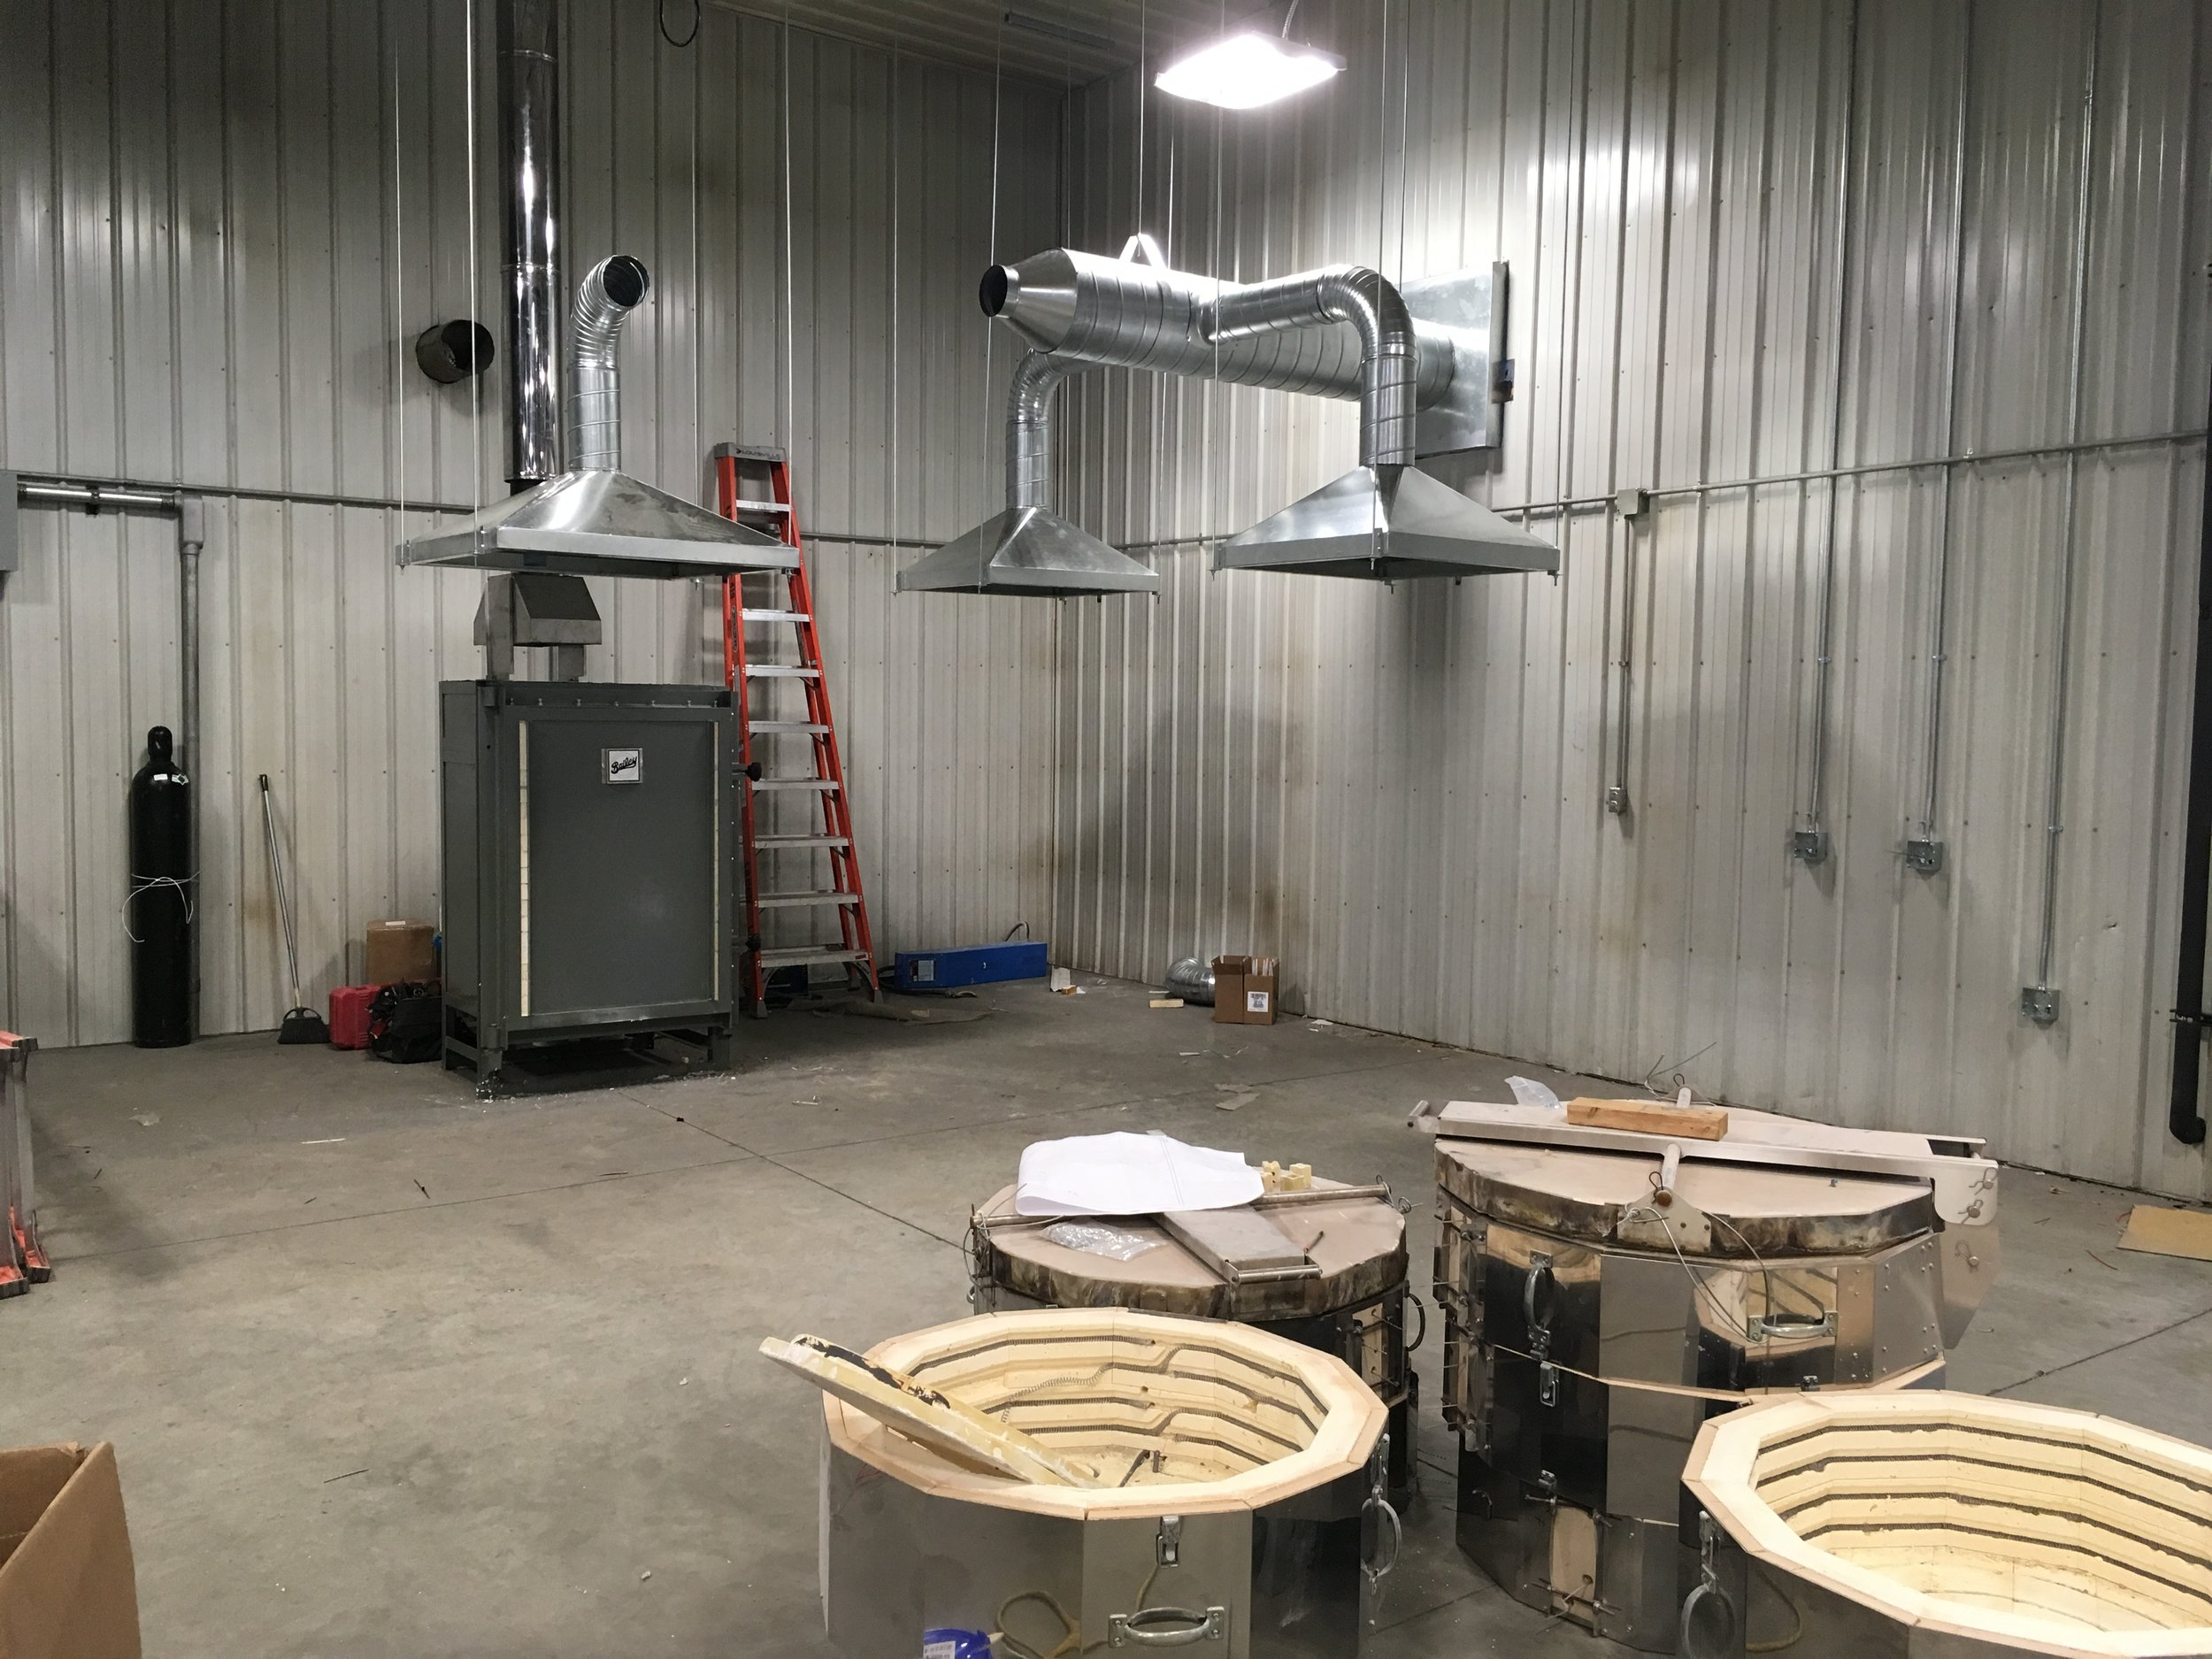 New UIU Art Studio coming together!